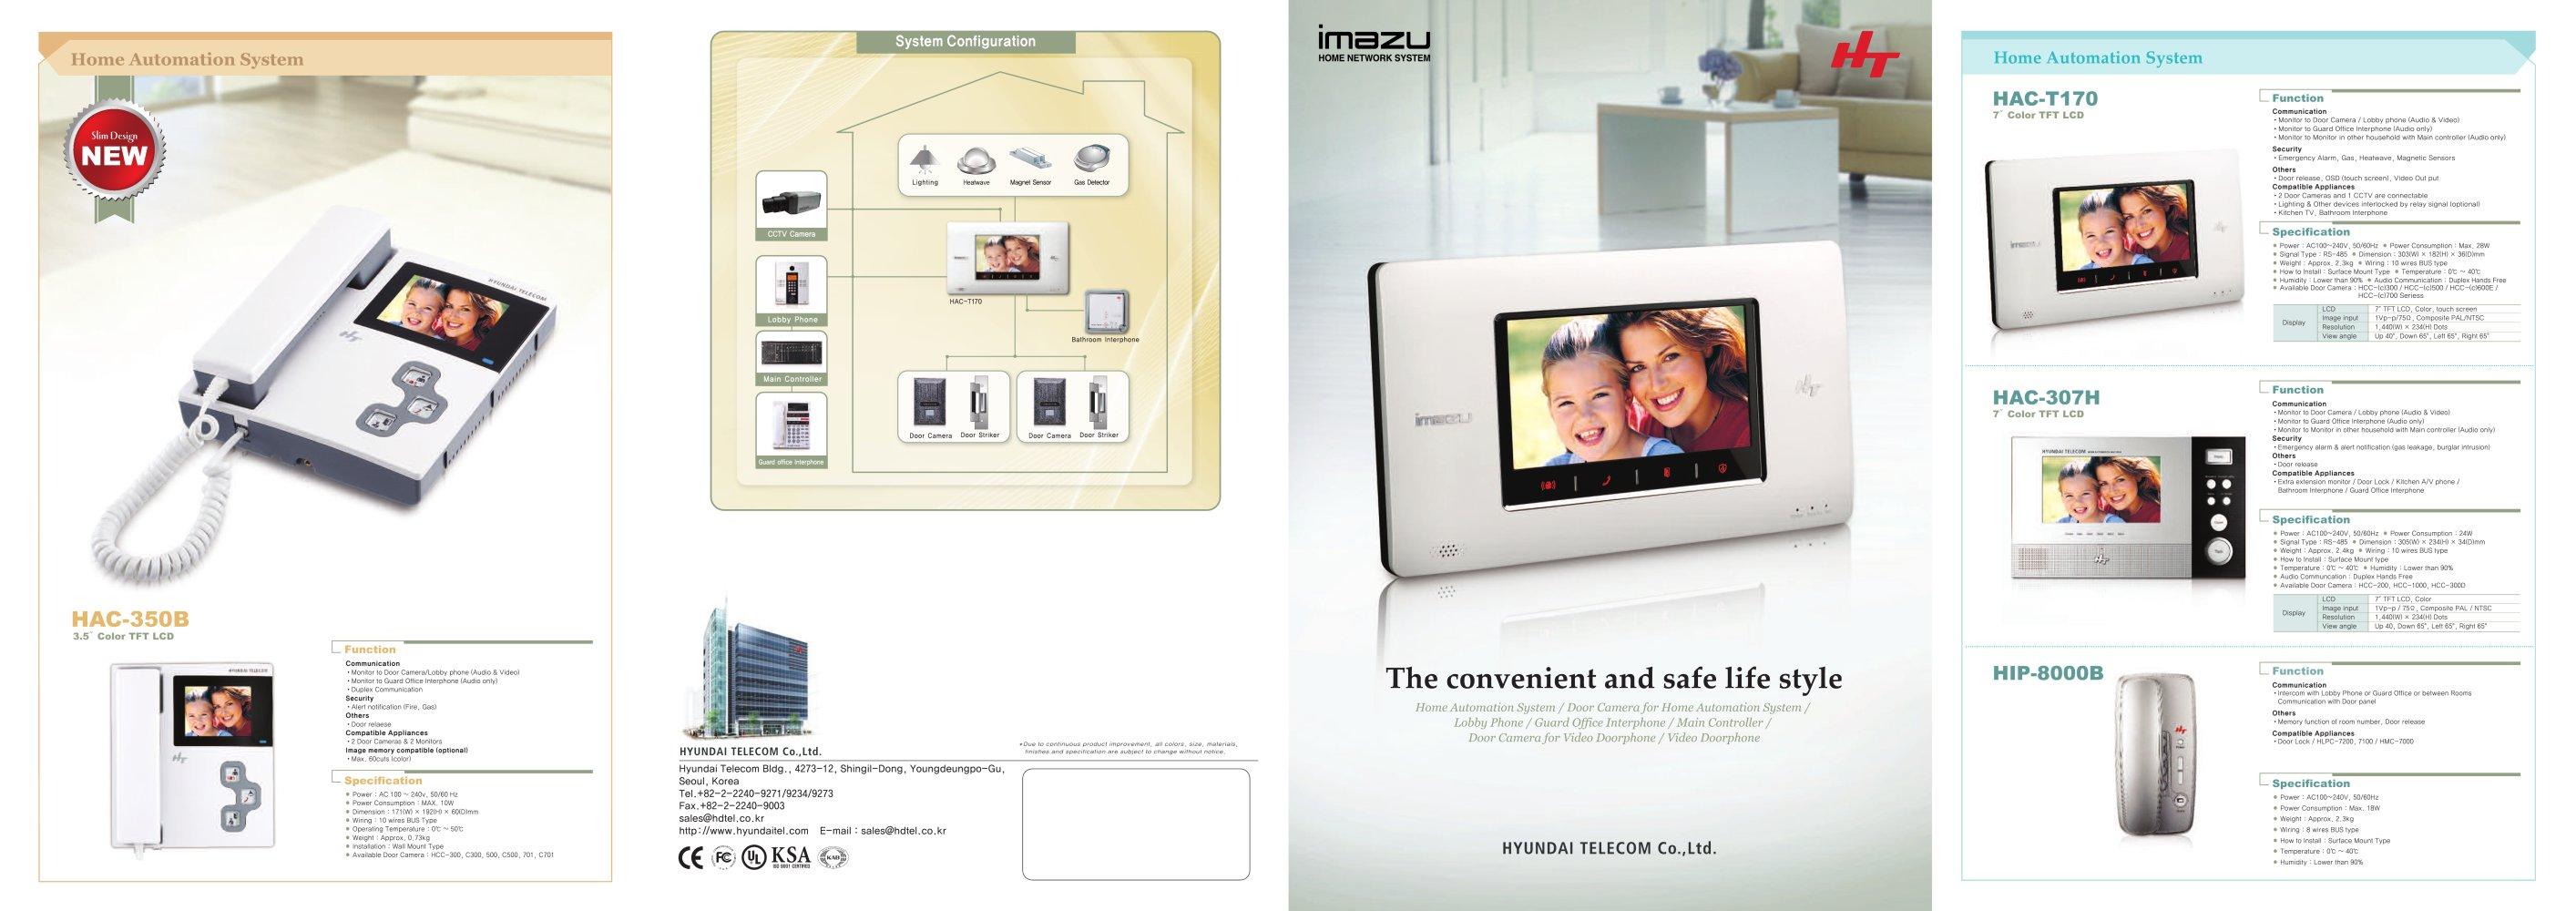 Hyundai Telecom Reflet Pdf Catalogues Cctv Wiring Diagram 1 2 Pages